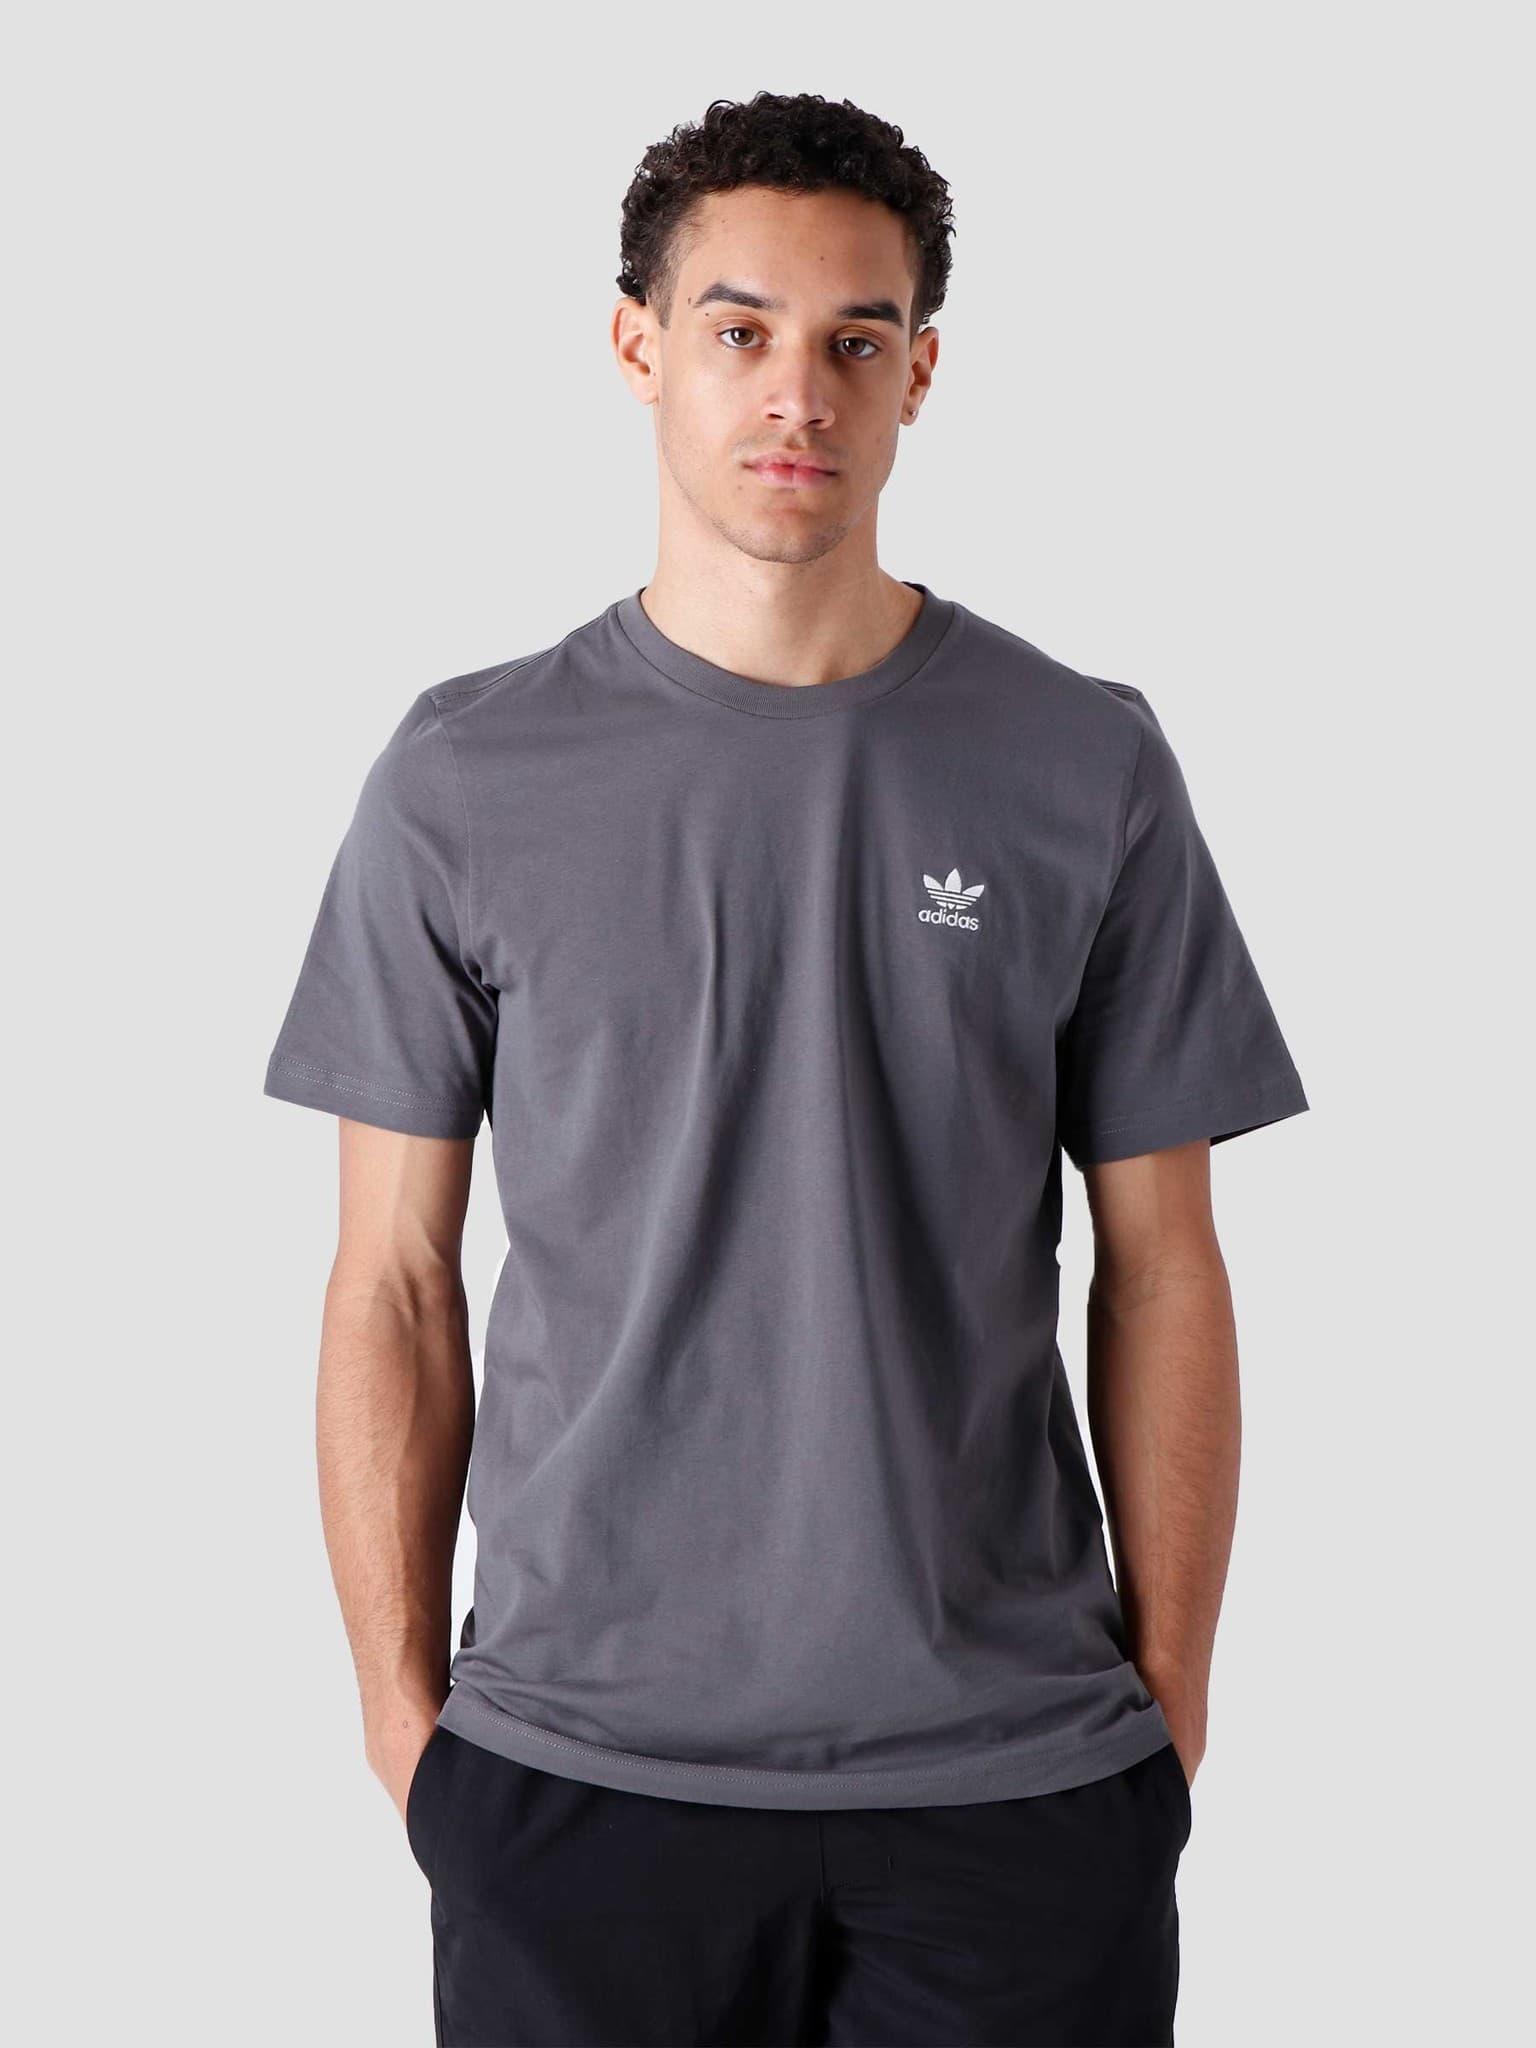 Essential T-Shirt Grefiv GN3413